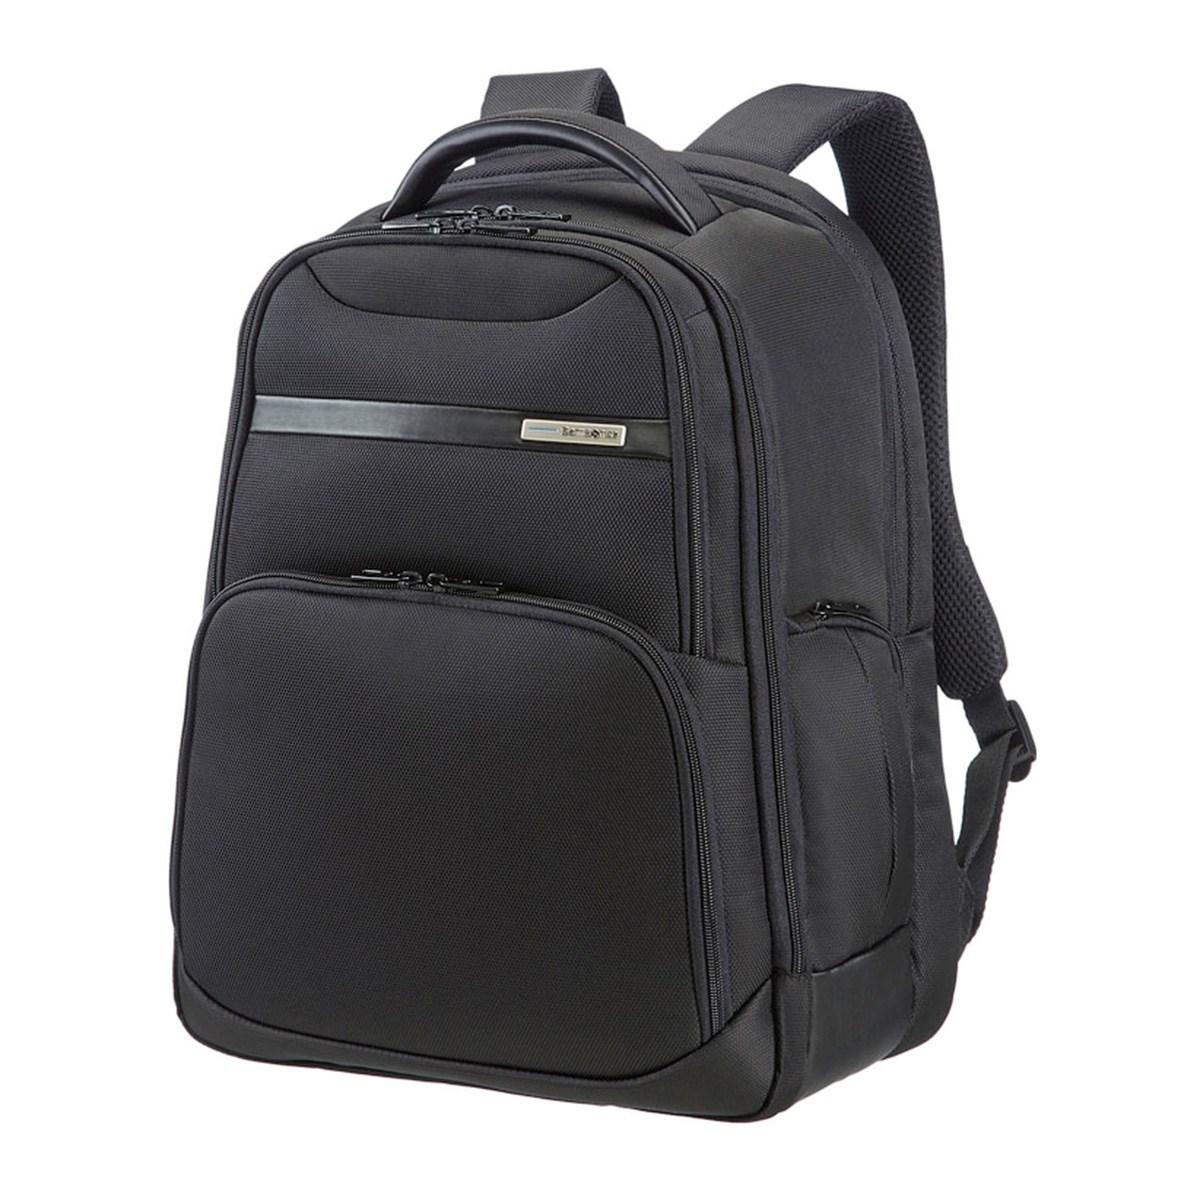 af84c17dbf Σακίδιο Πλάτης Samsonite Vectura Laptop Backpack M 15-16″ 59226 ...